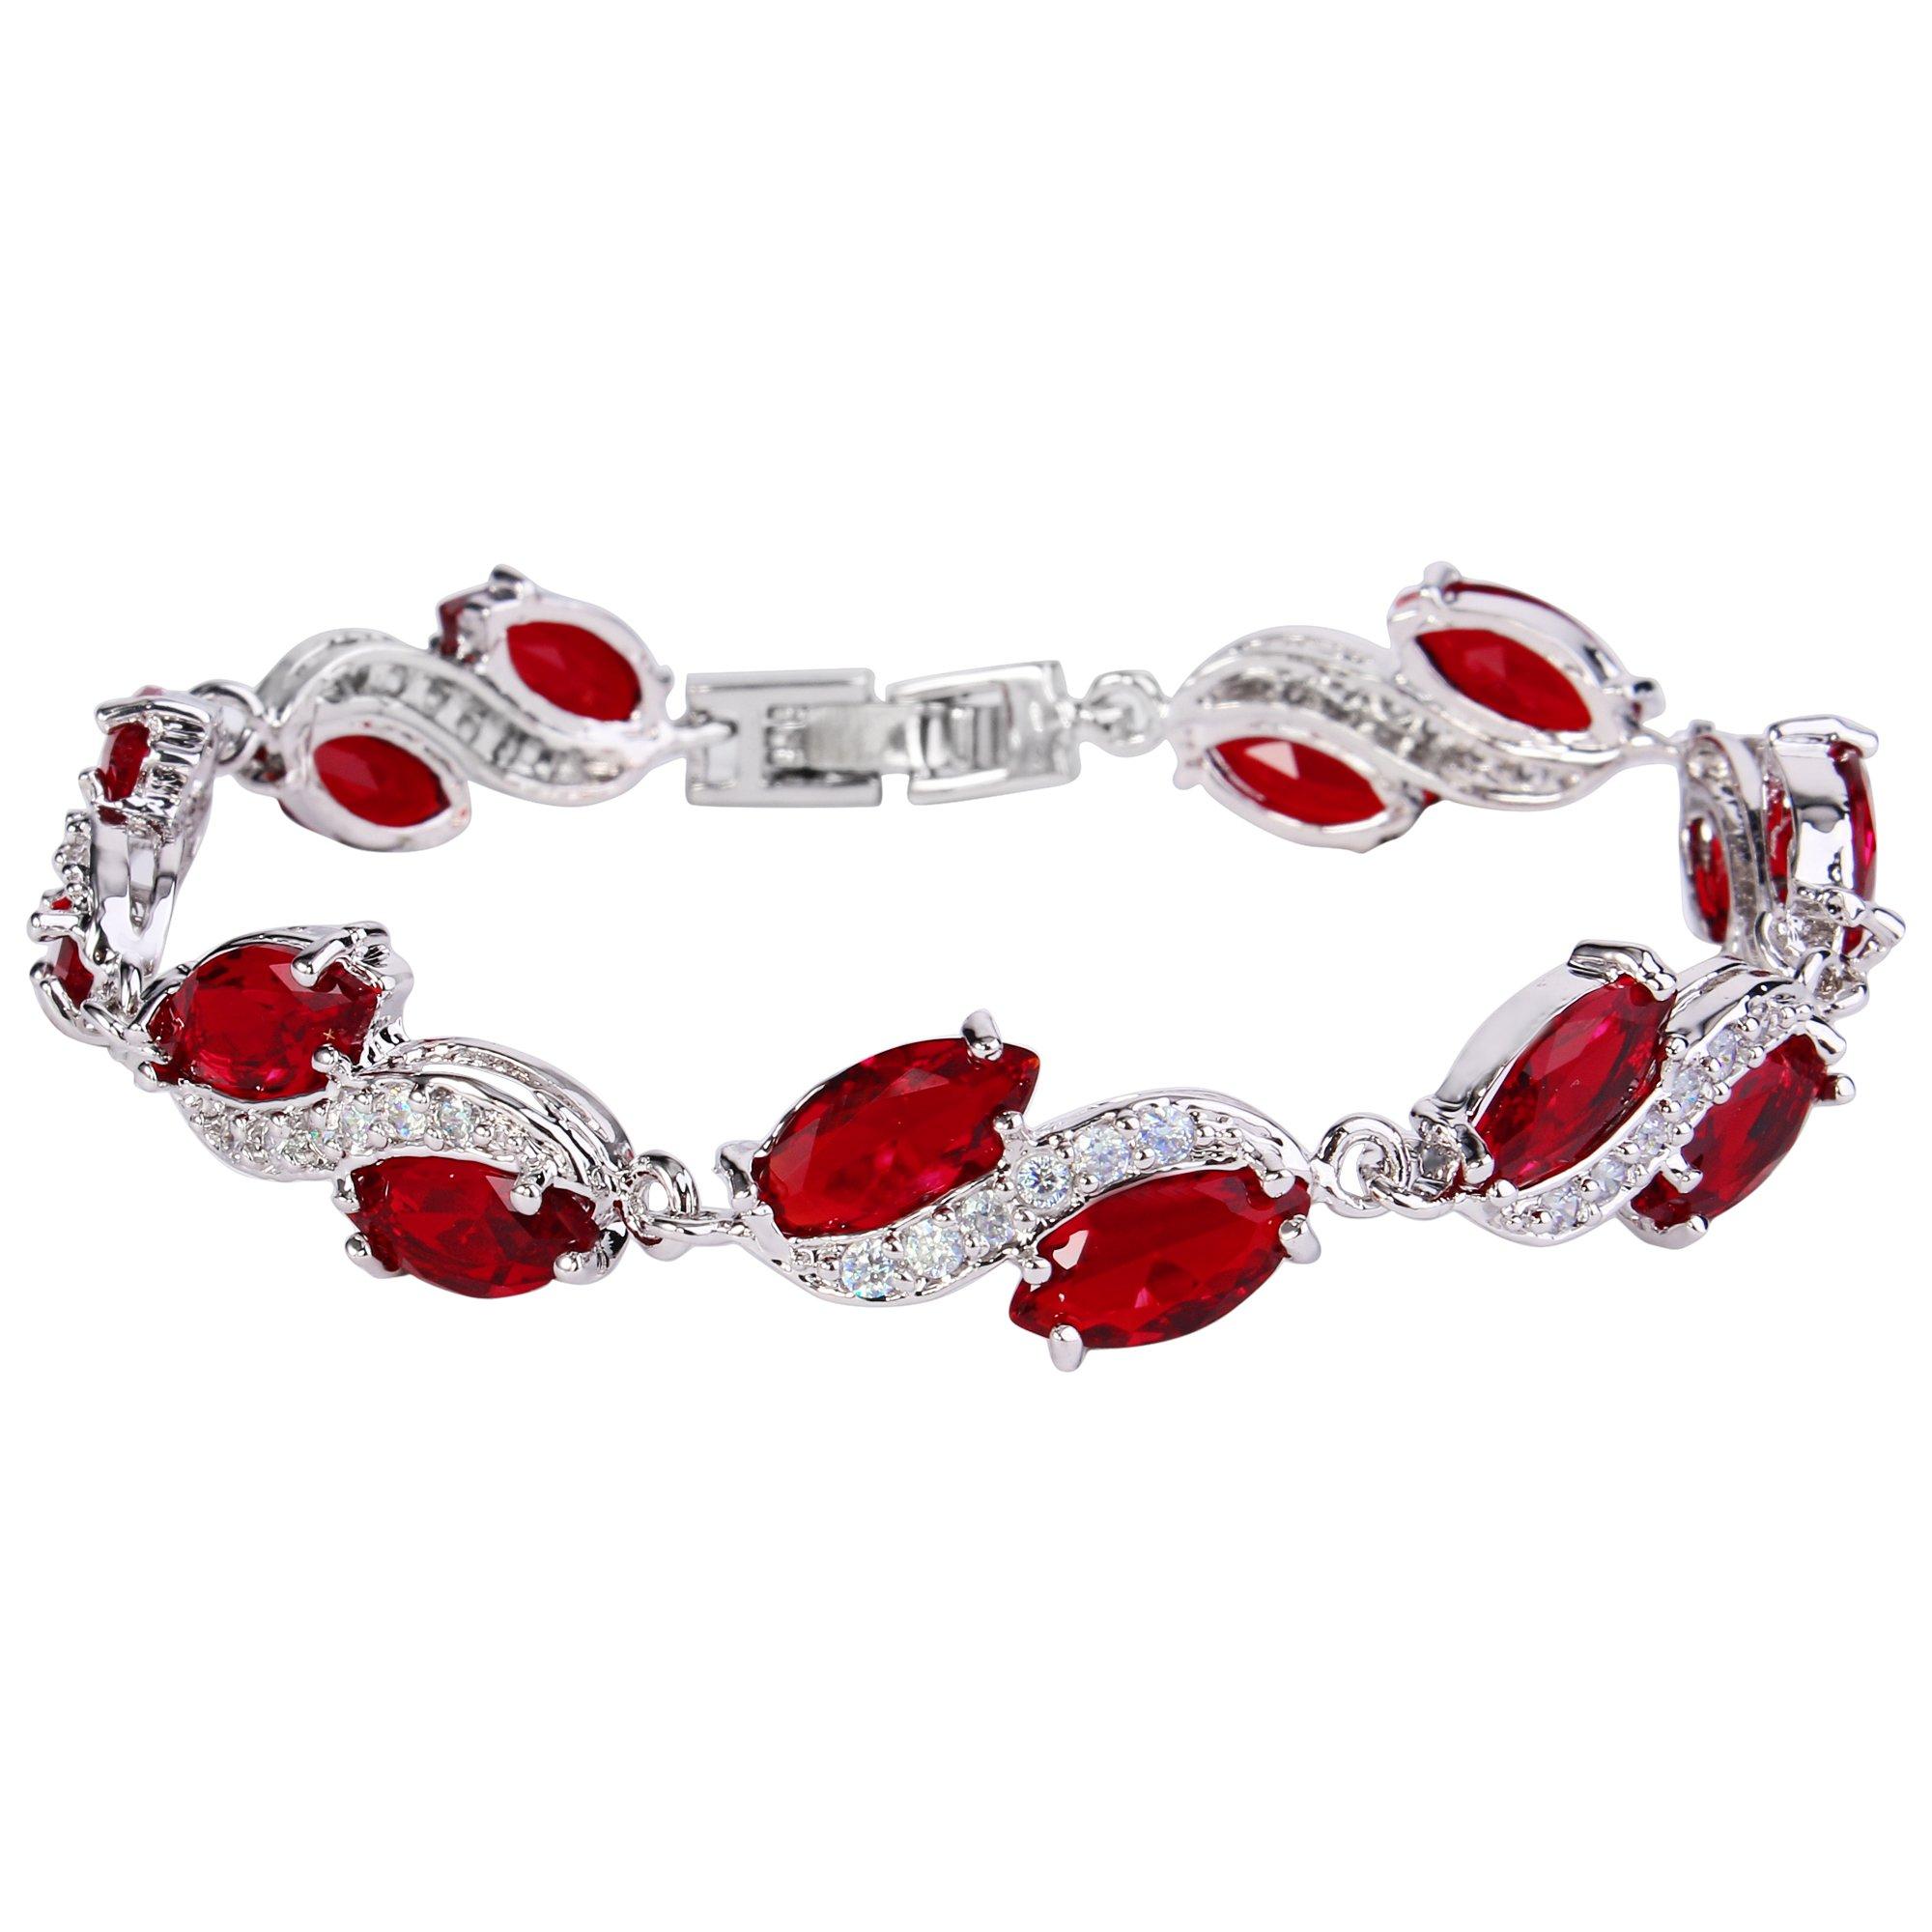 EleQueen Women's Silver-tone Full Cubic Zirconia Marquise Leaf Roman Tennis Bracelet Ruby Color